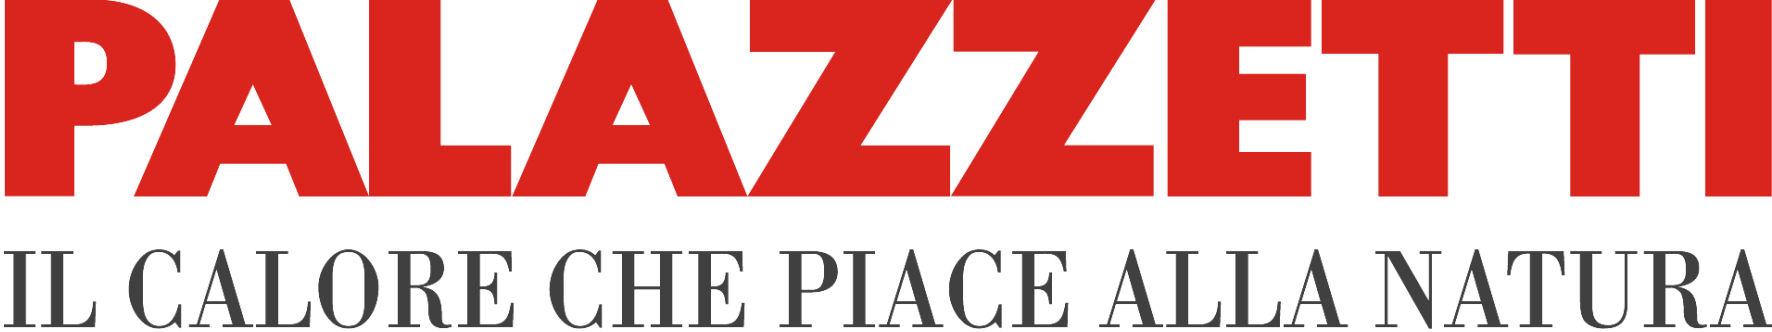 logo-palazzetti-2001-ok